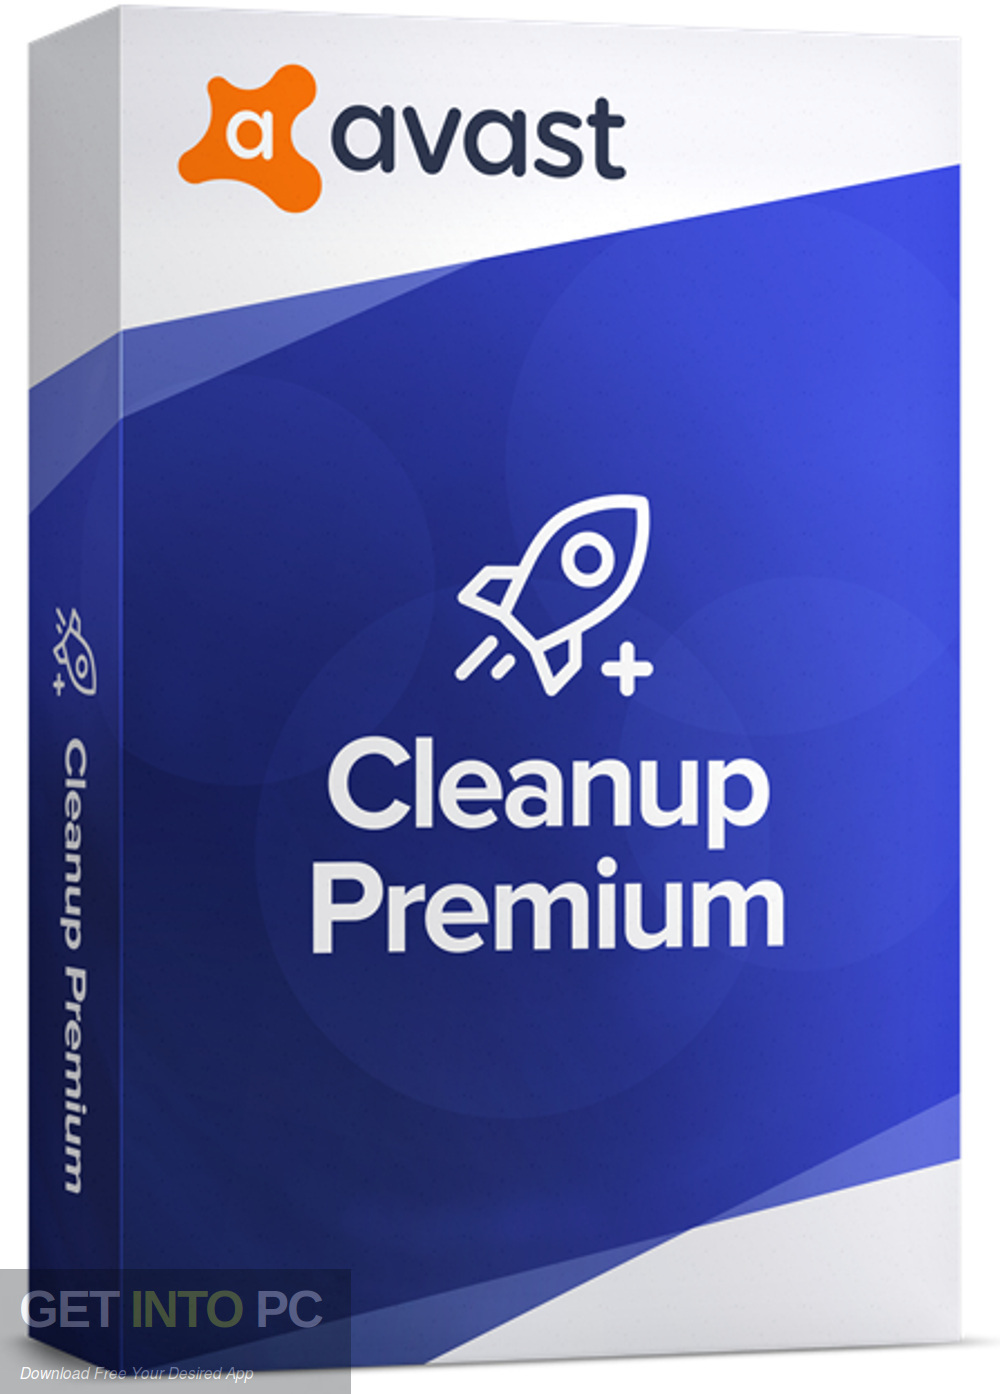 avast cleanup premium free key